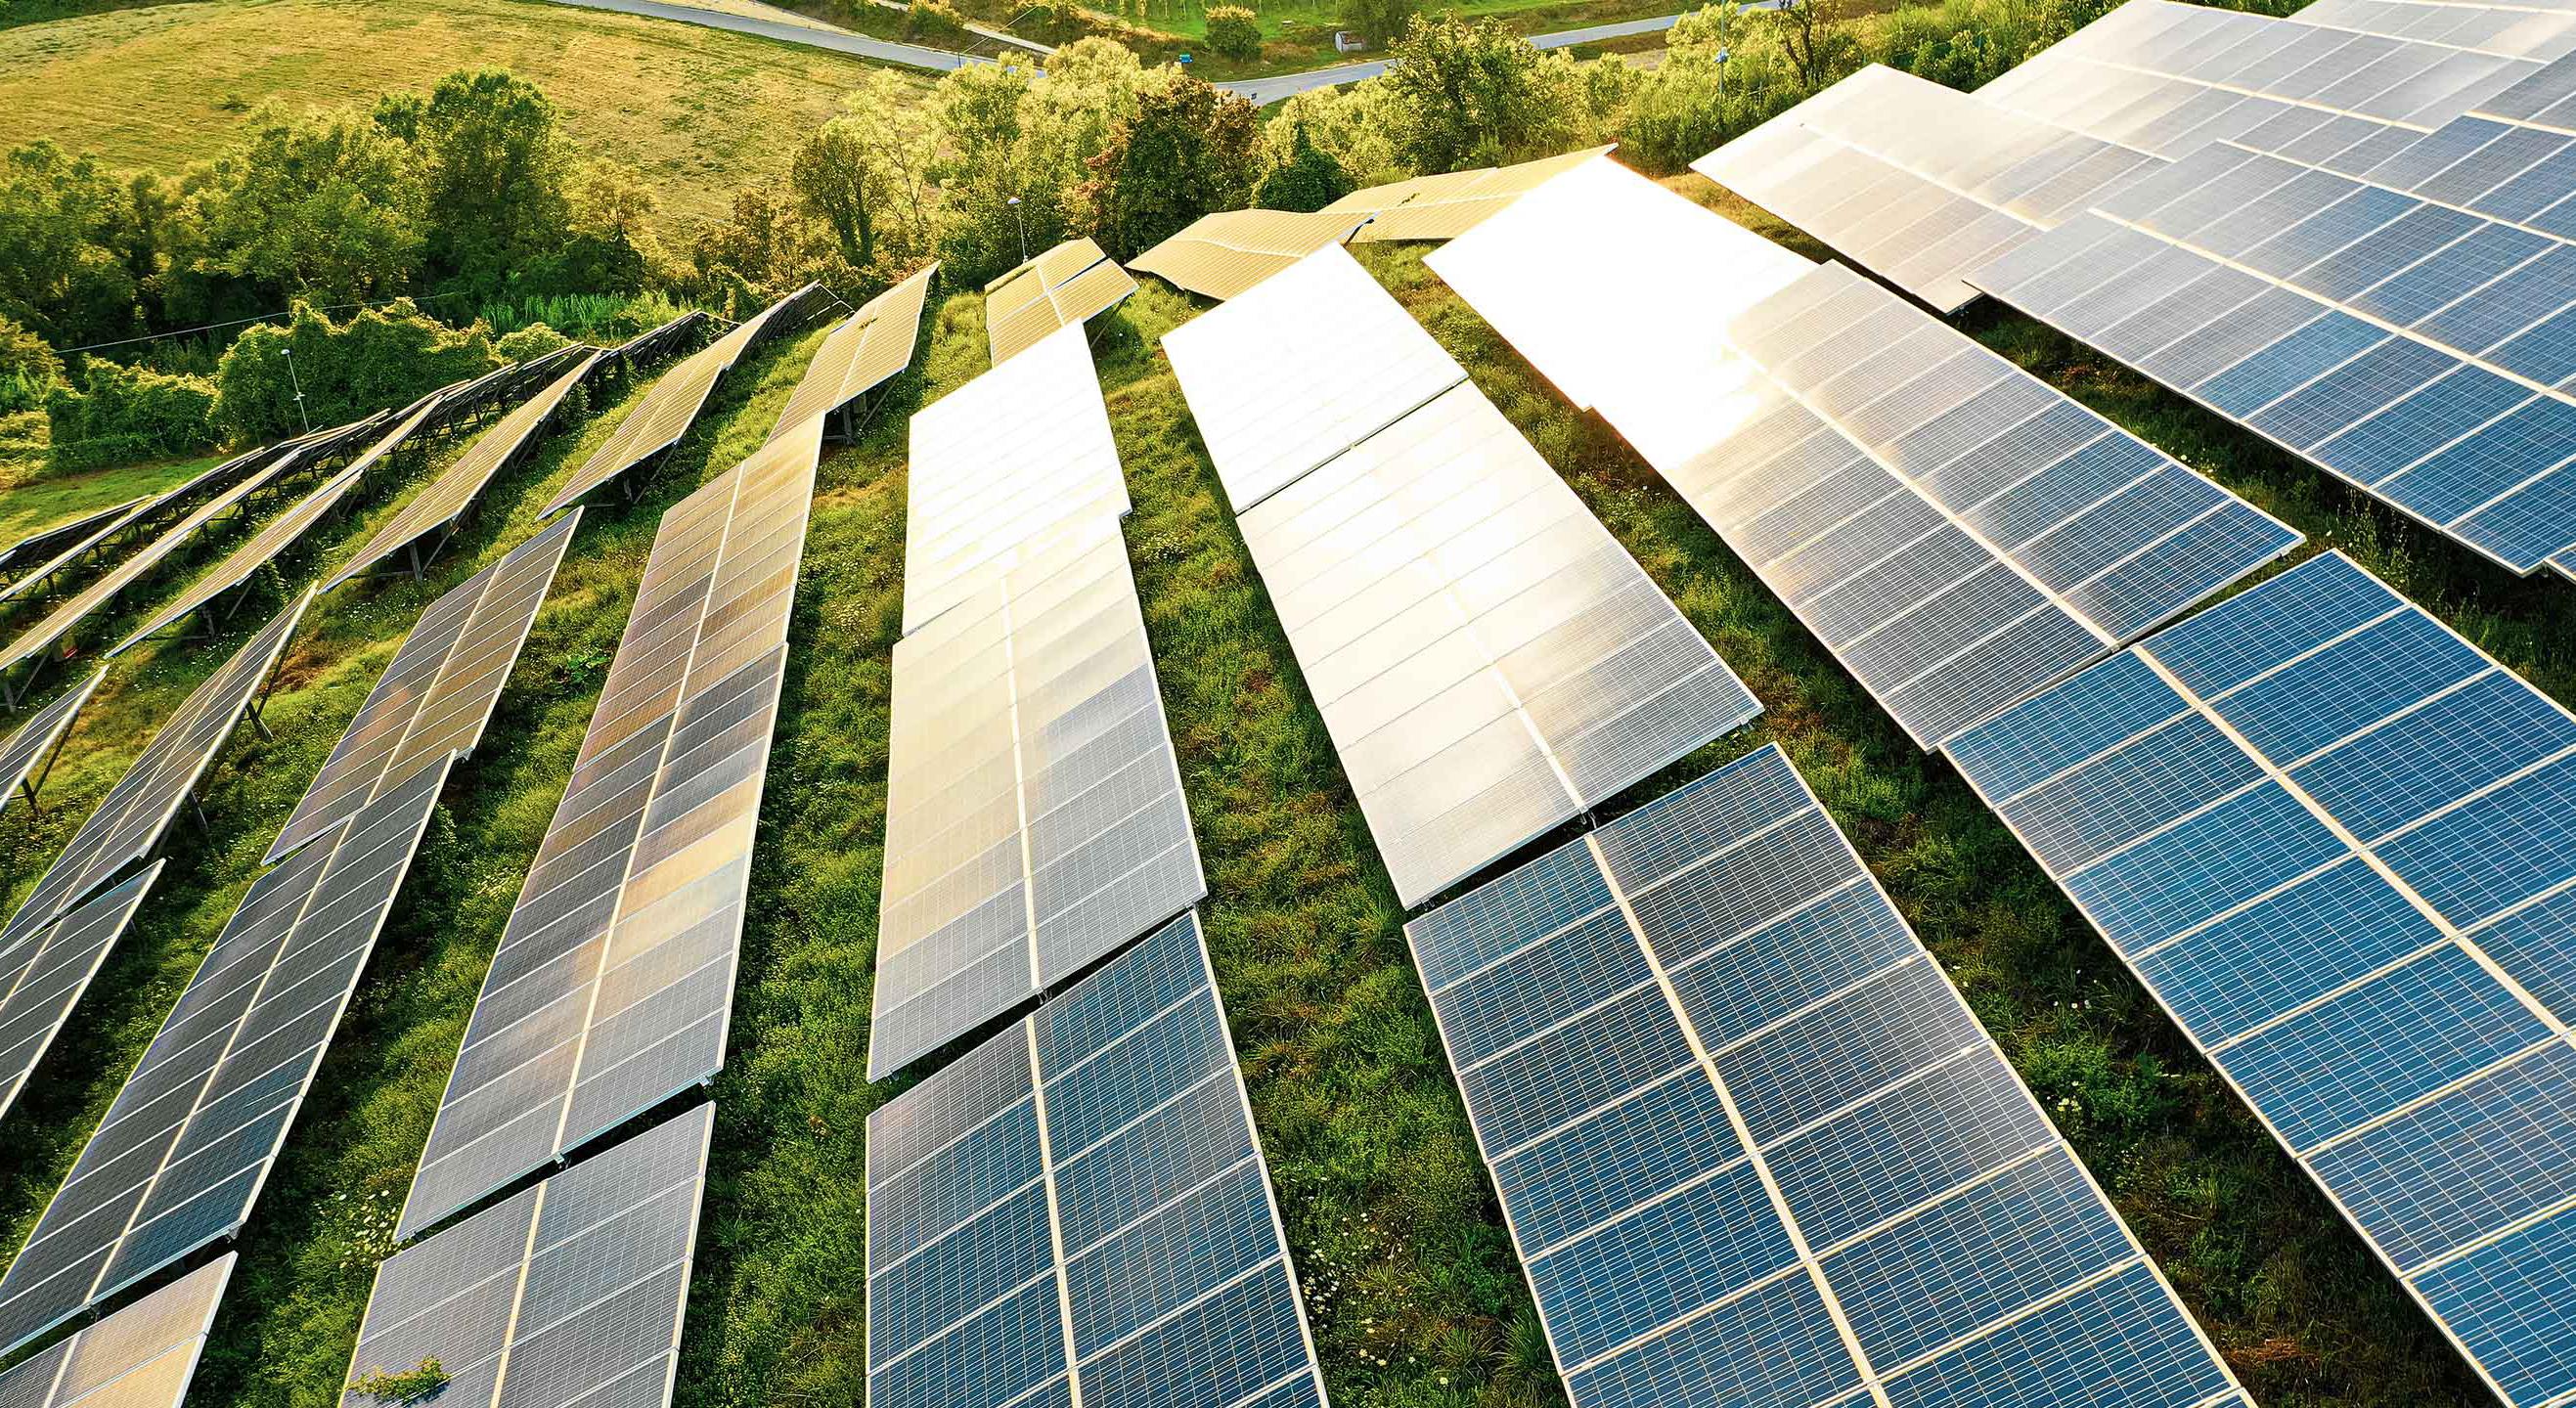 a field of solar panels among a green field